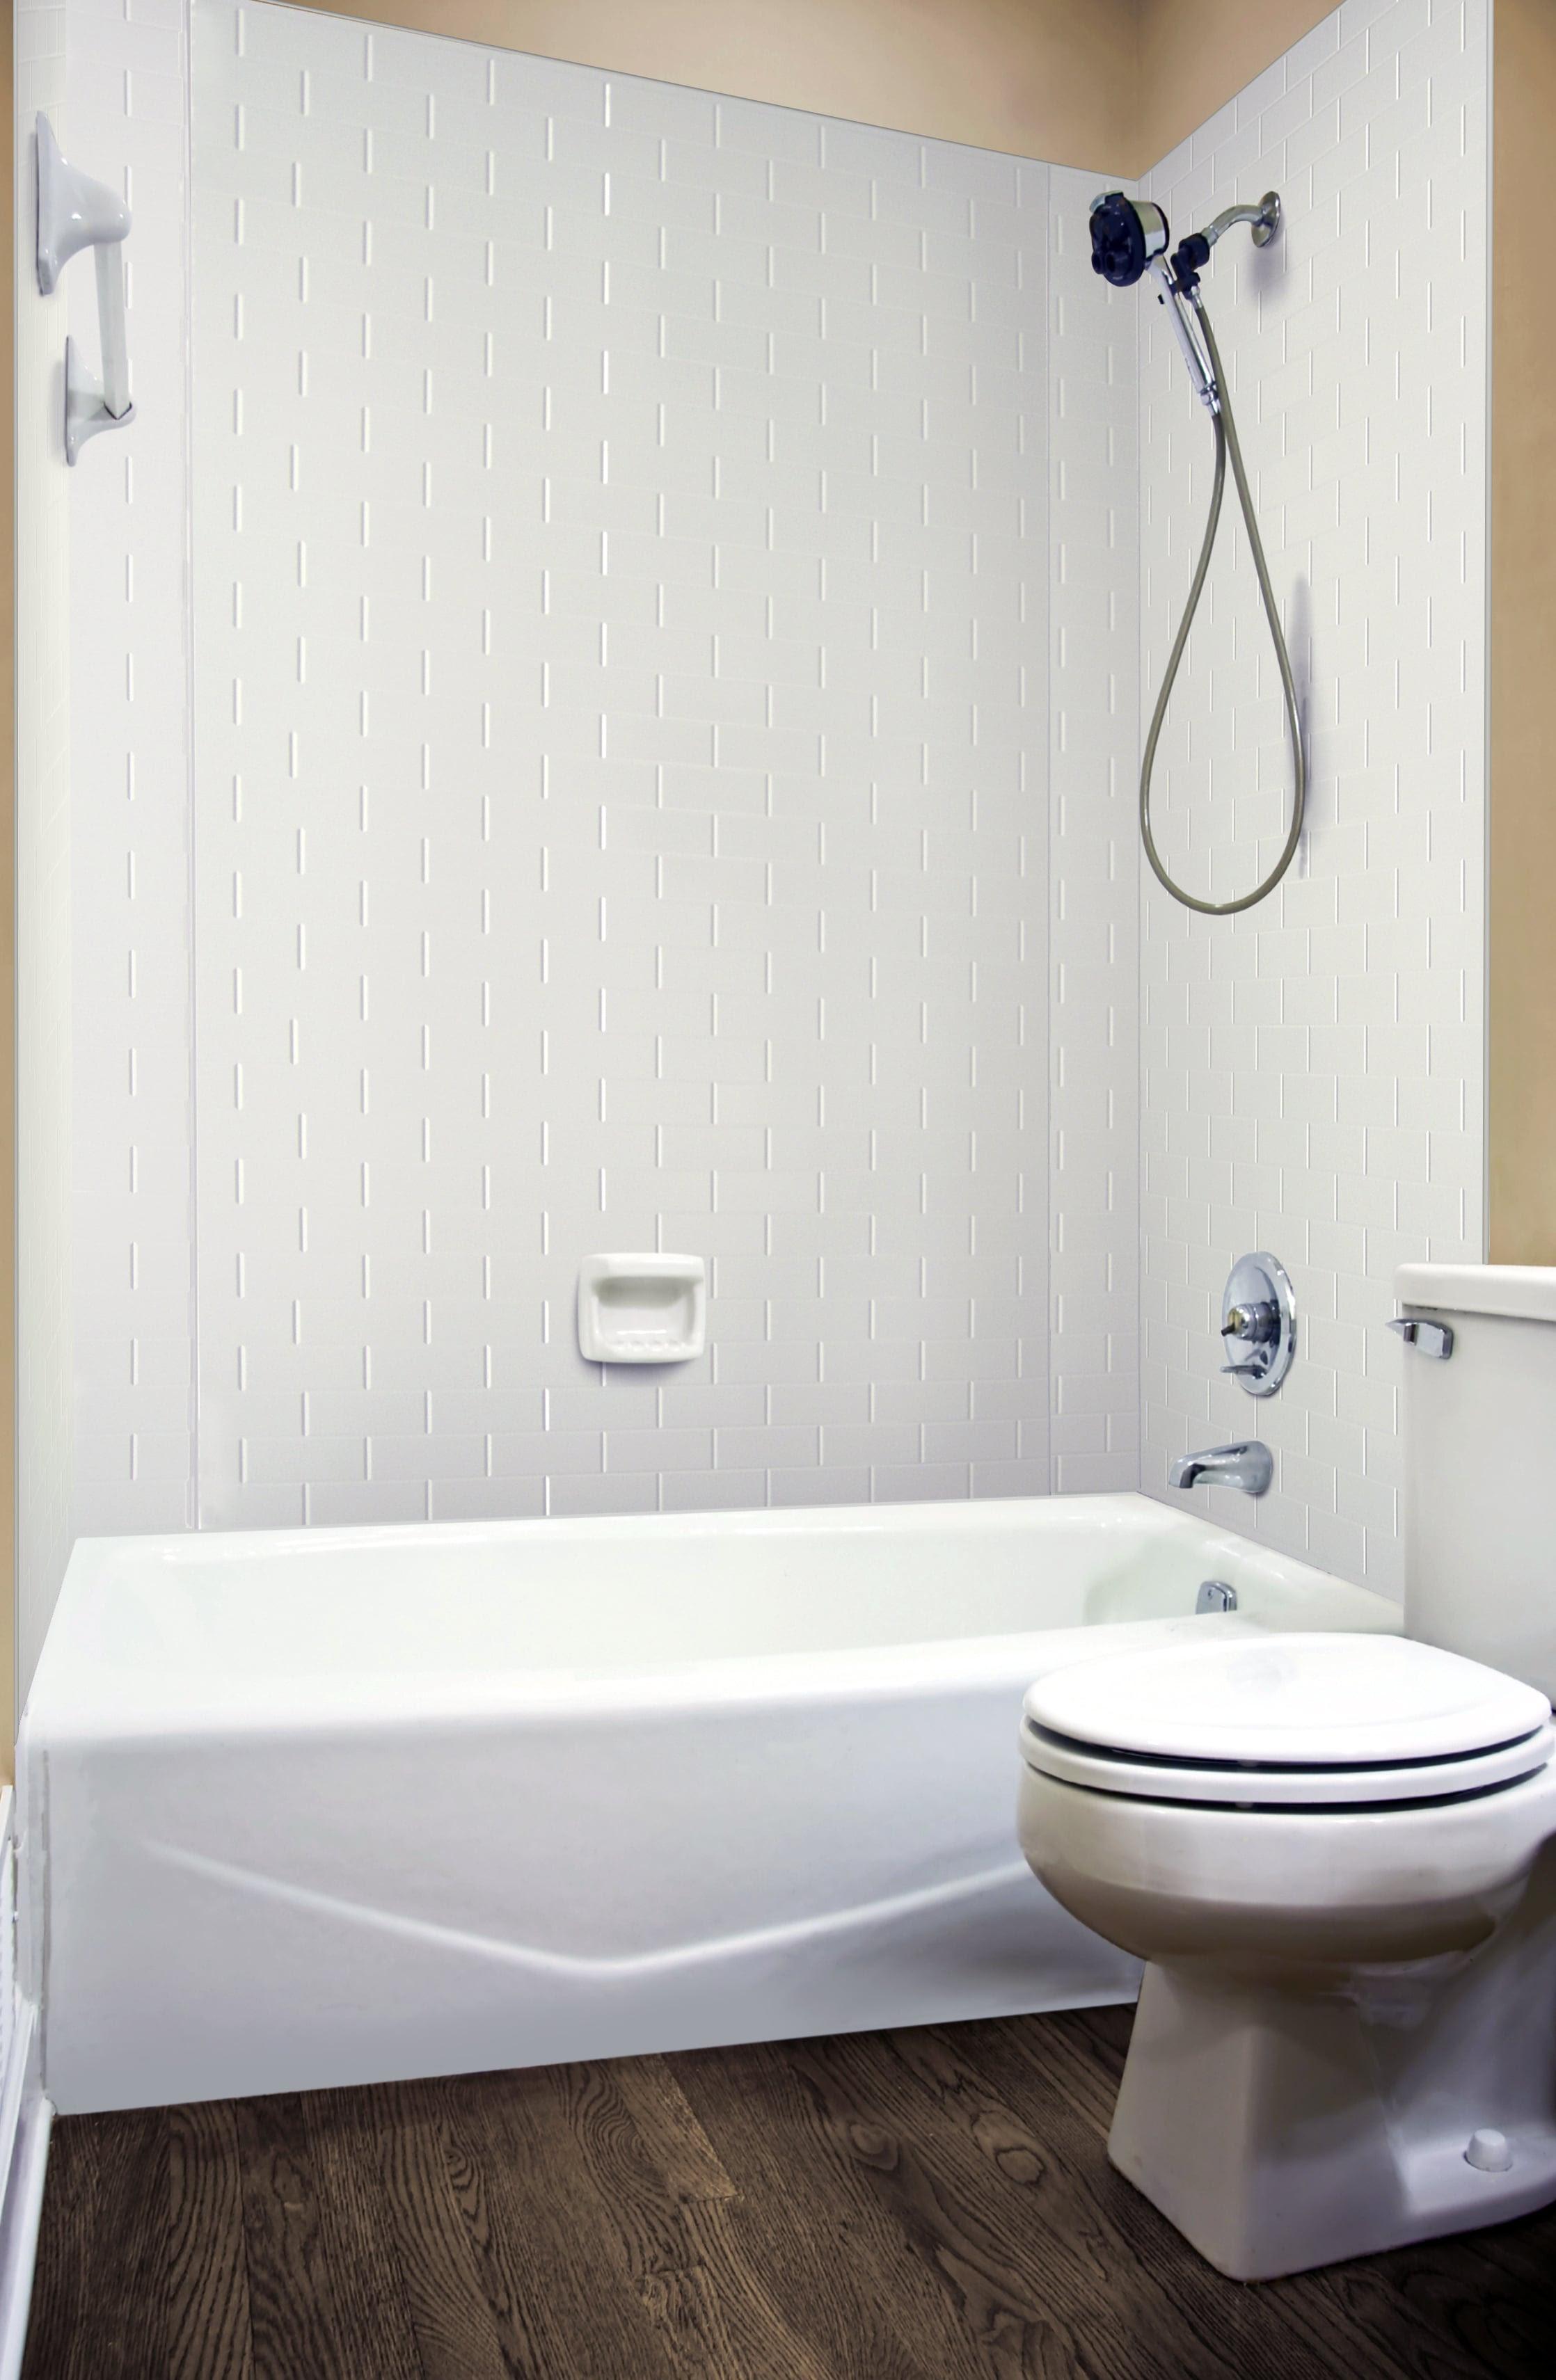 MirroFlex Tub and Shower Surrounds | ATI Laminates